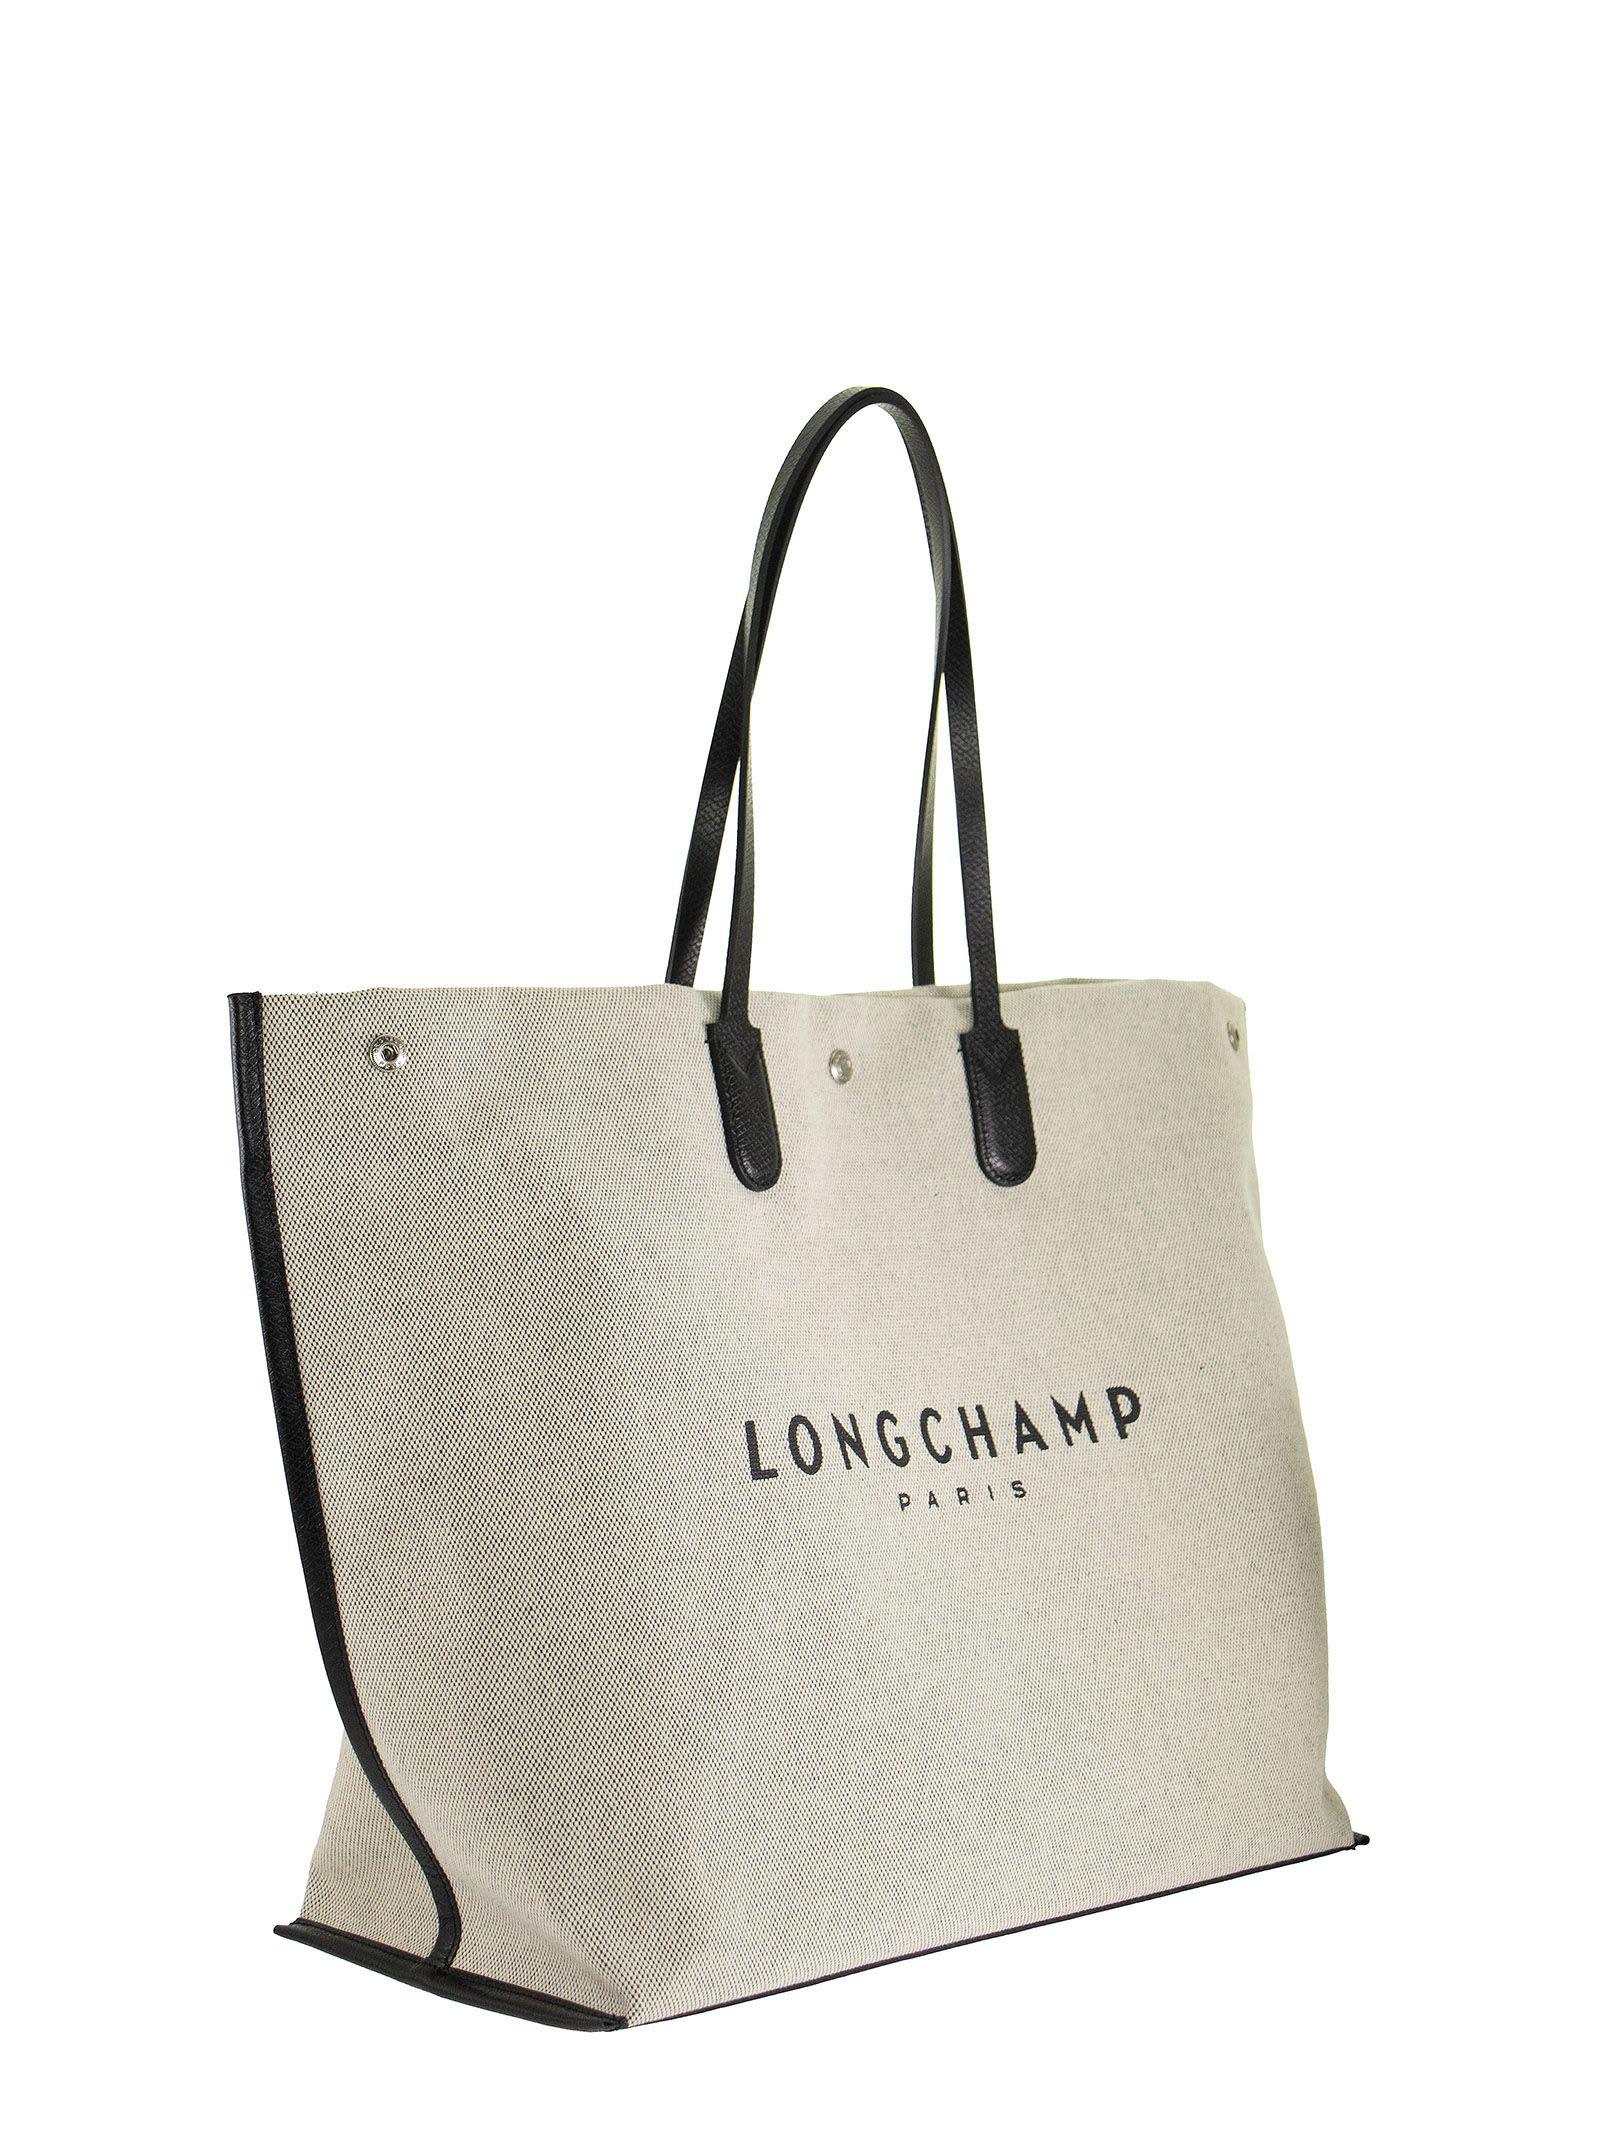 Longchamp Roseau Shopping Bag Xl | italist, ALWAYS LIKE A SALE